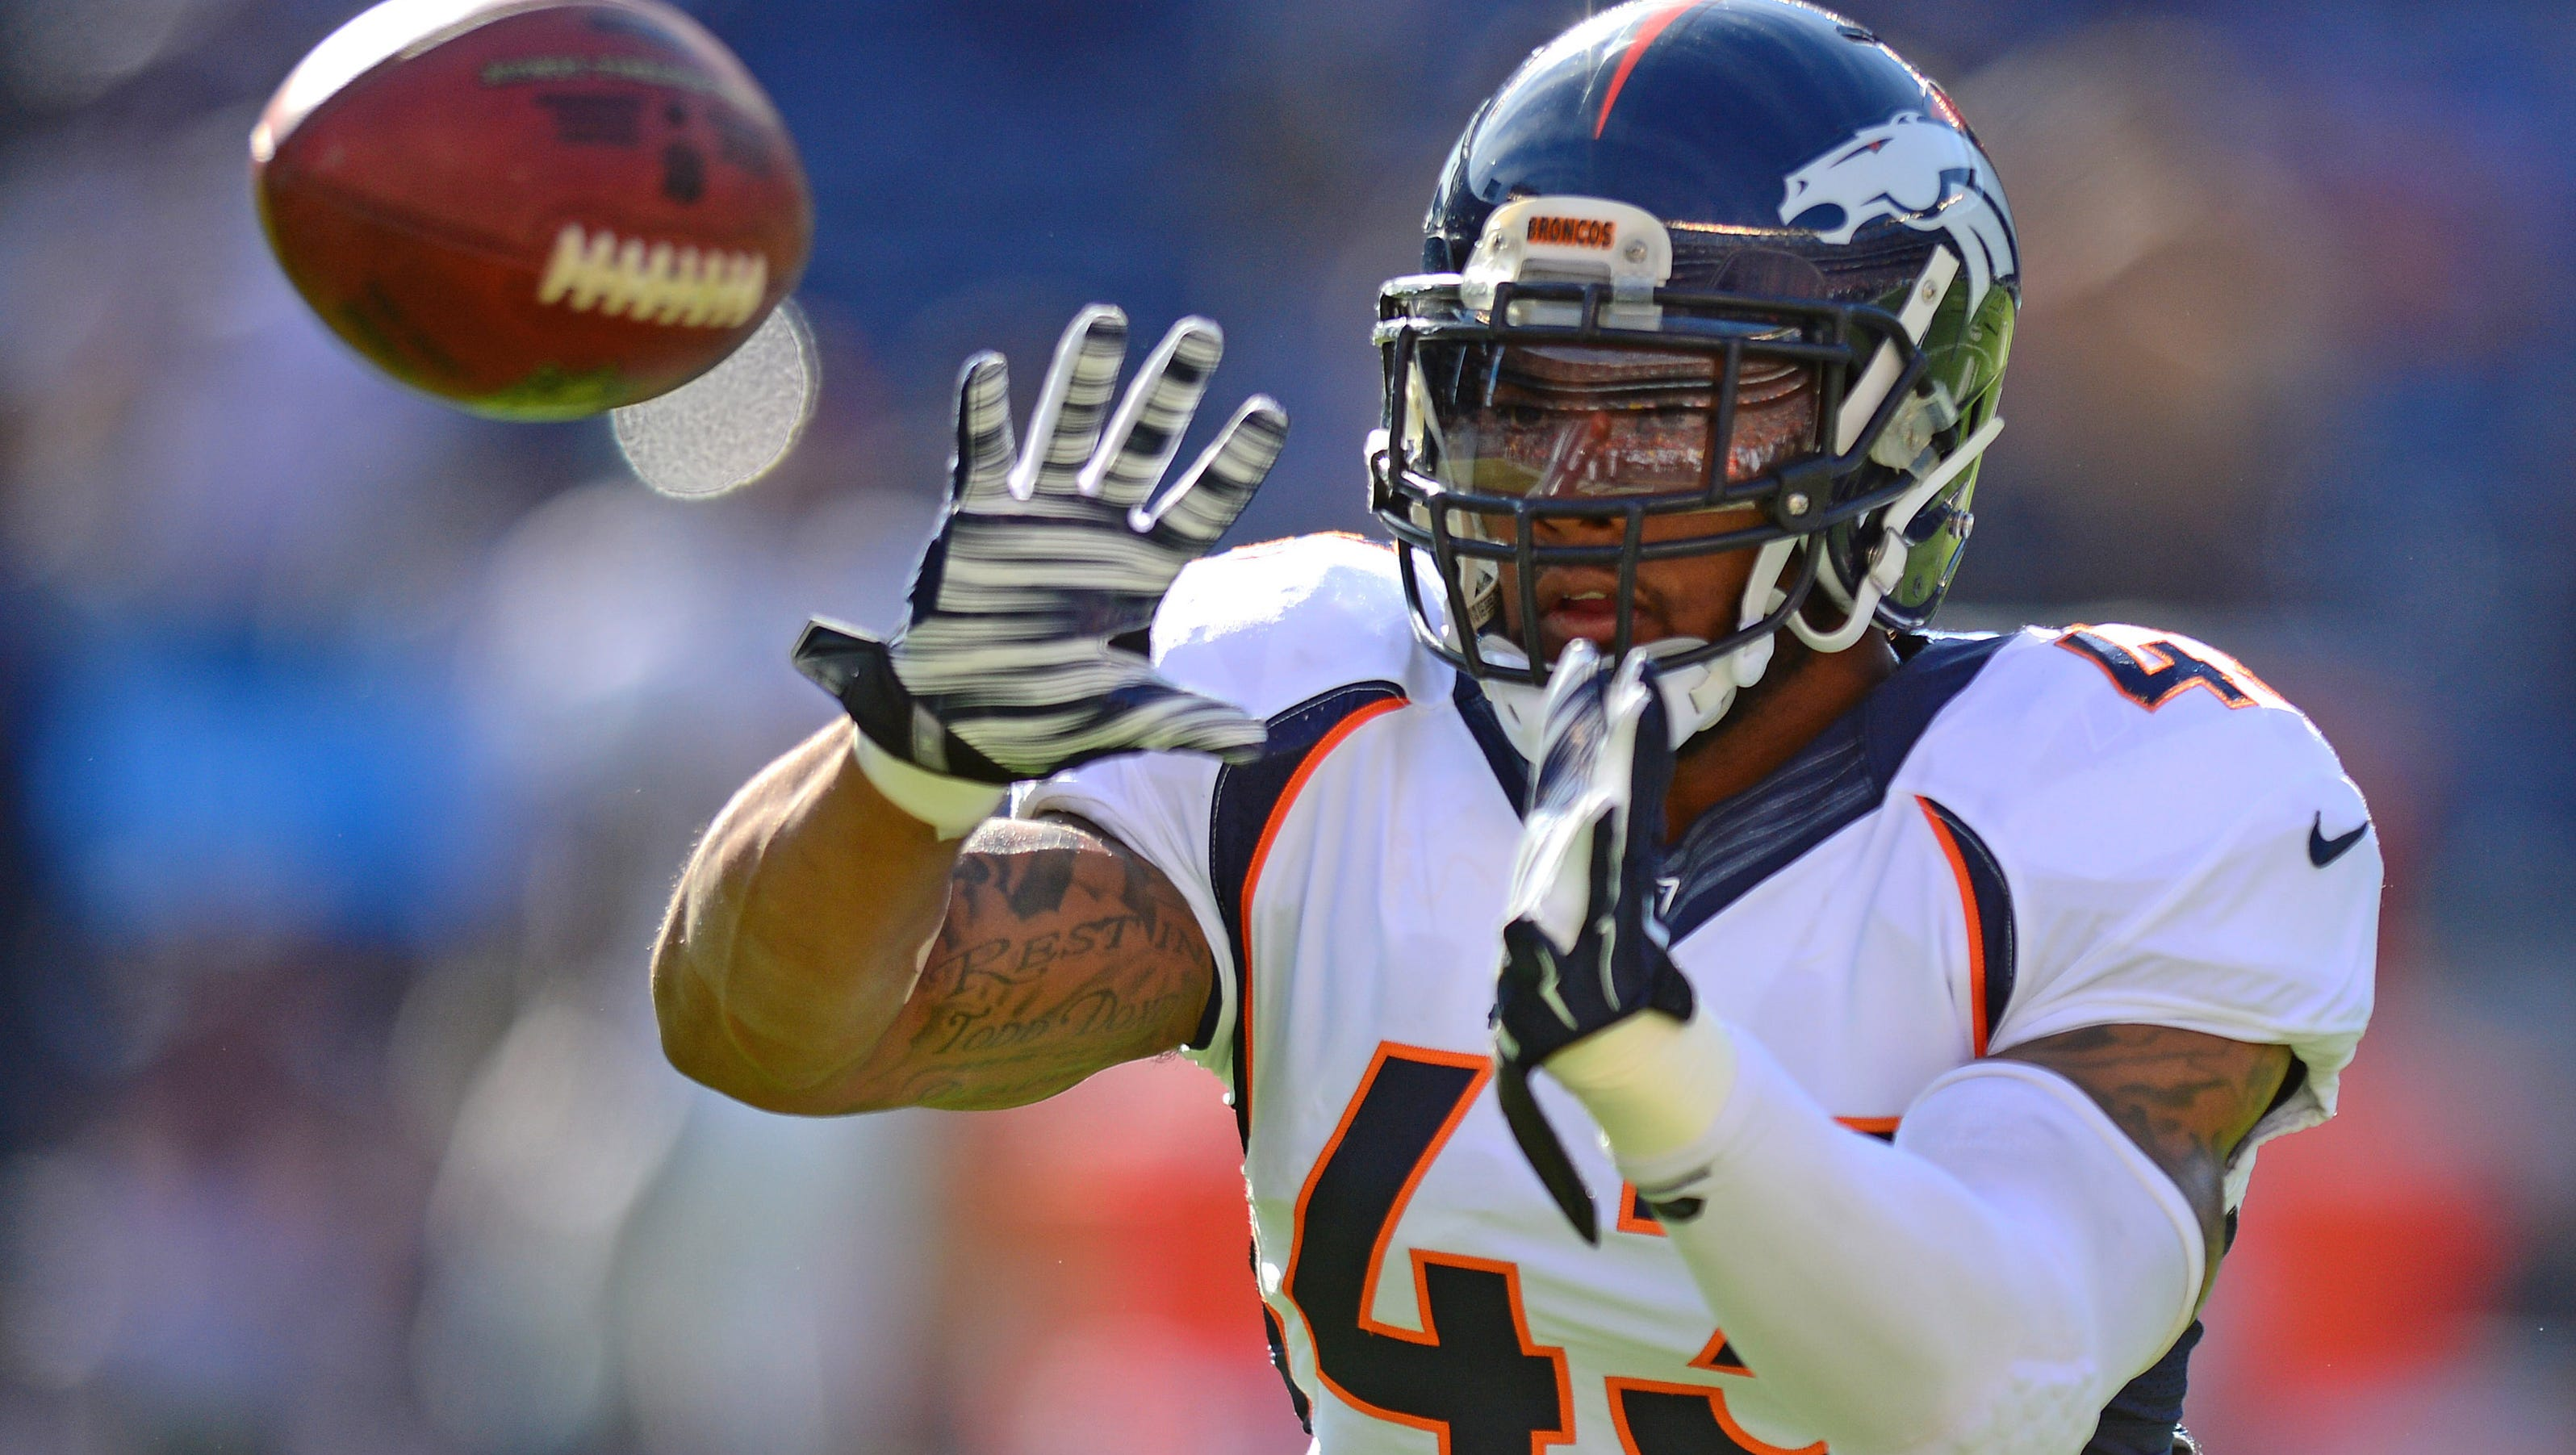 Broncos Defense Stays Focused On Ultimate Goal